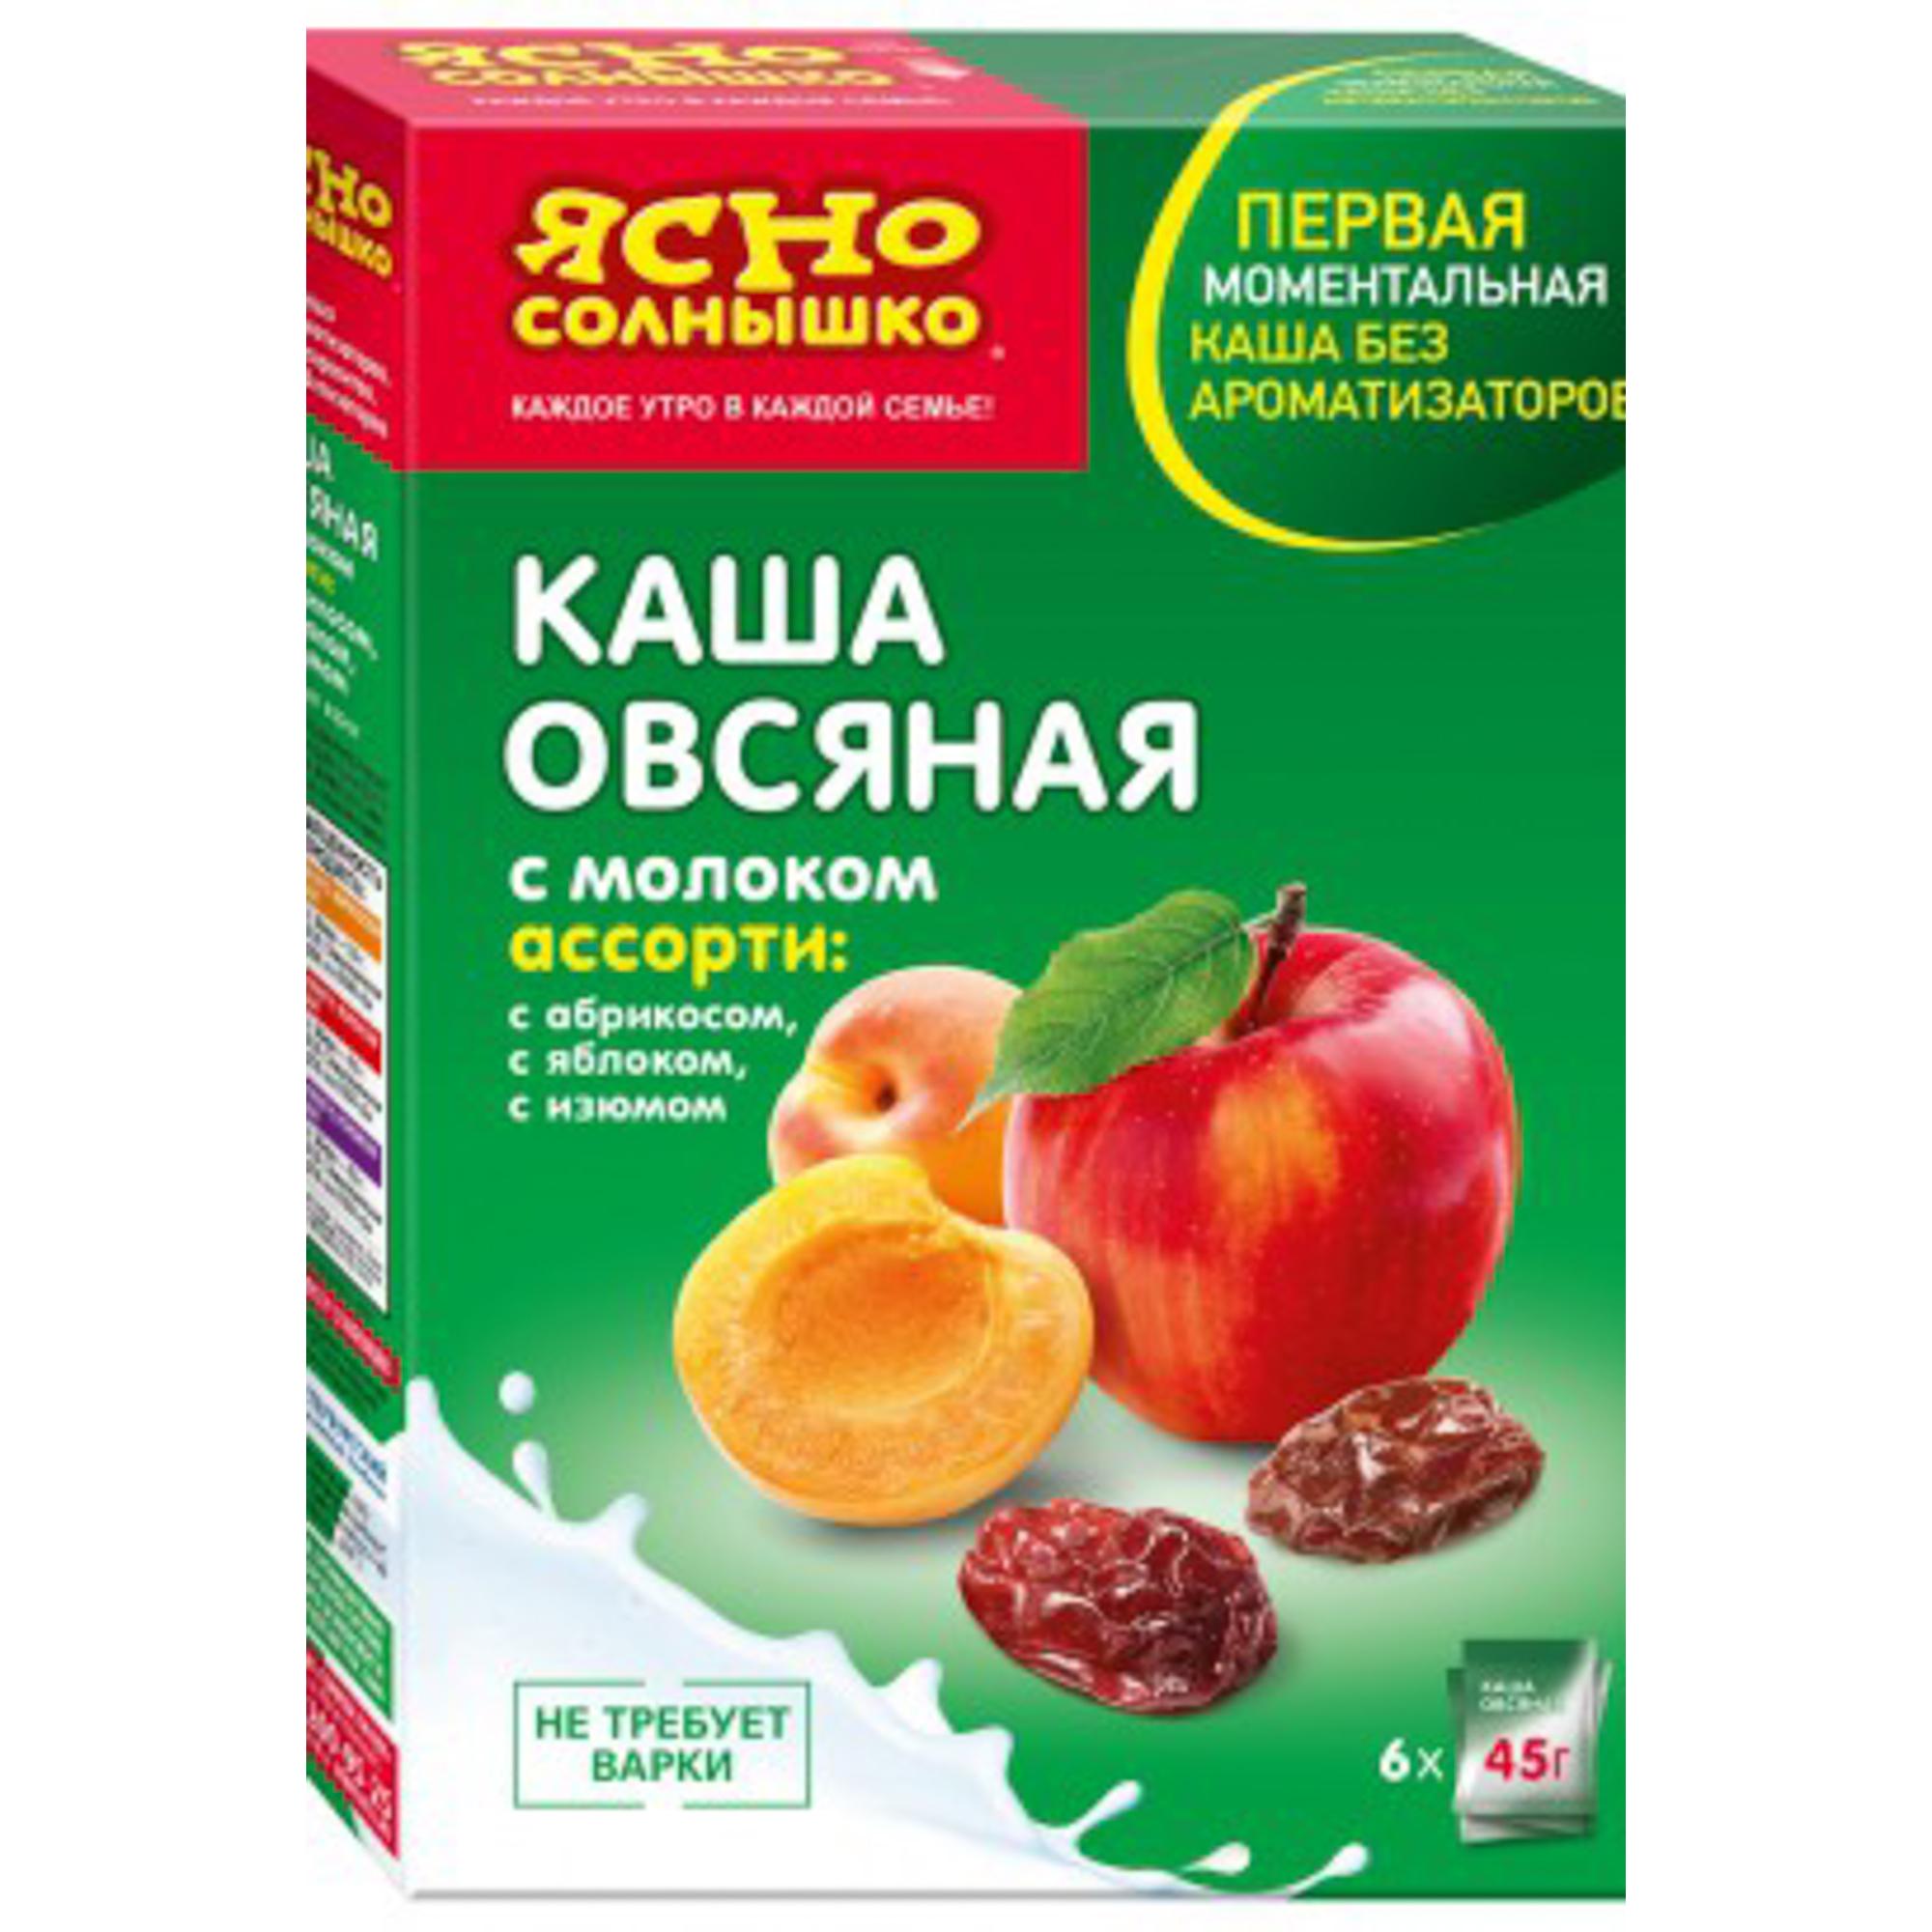 Каша овсяная Ясно Солнышко с абрикосом 6х40 г